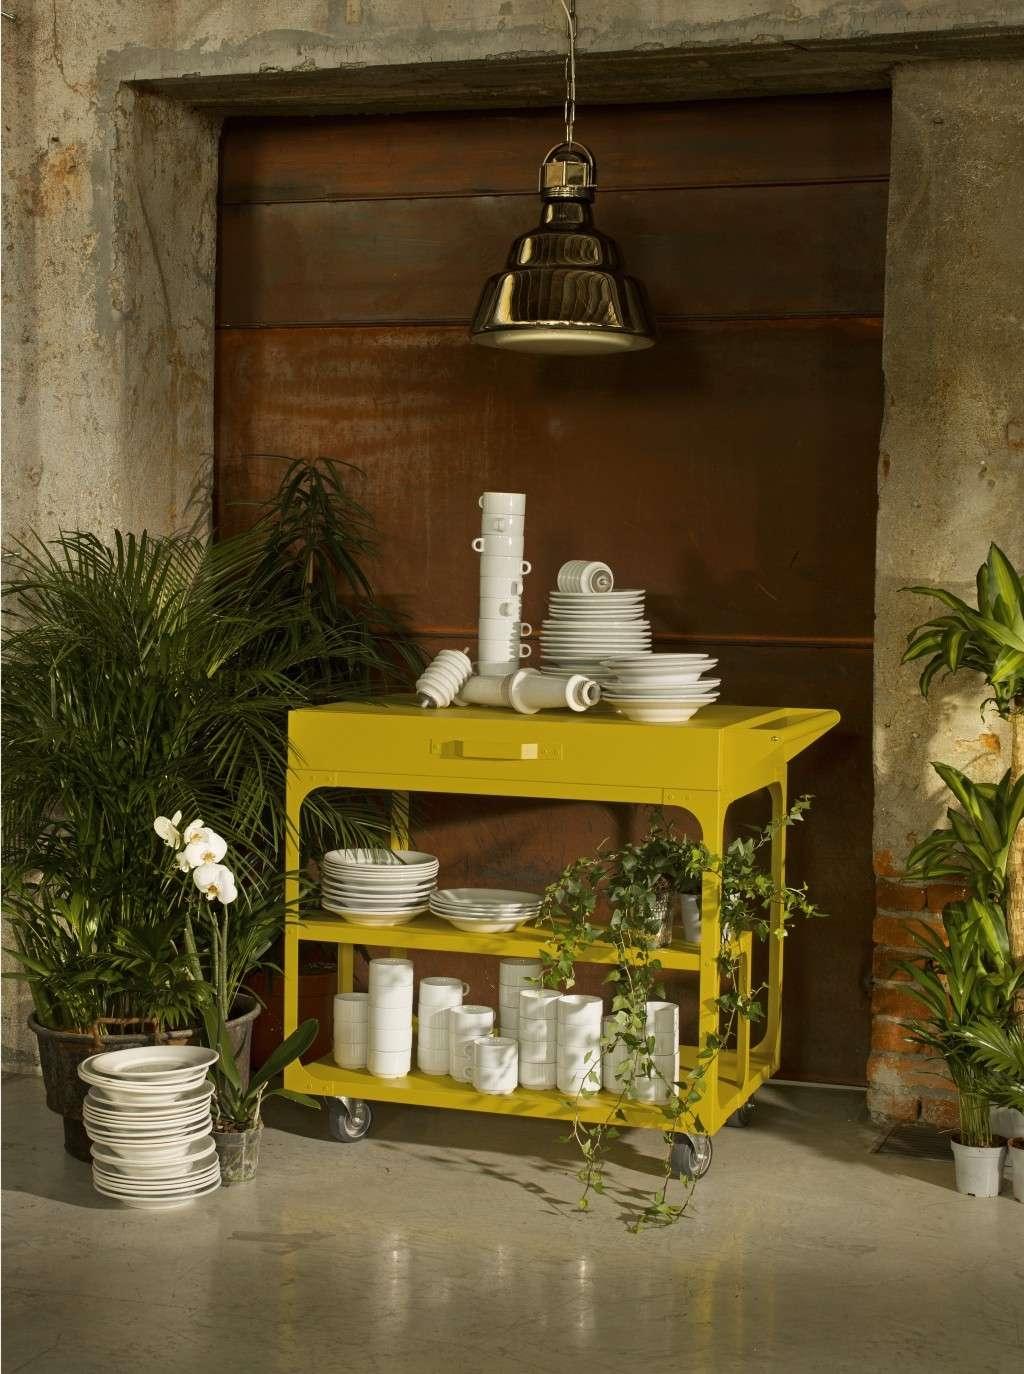 Carrello Cucina Design. Stunning Best Ikea Carrelli Da Cucina Ideas ...